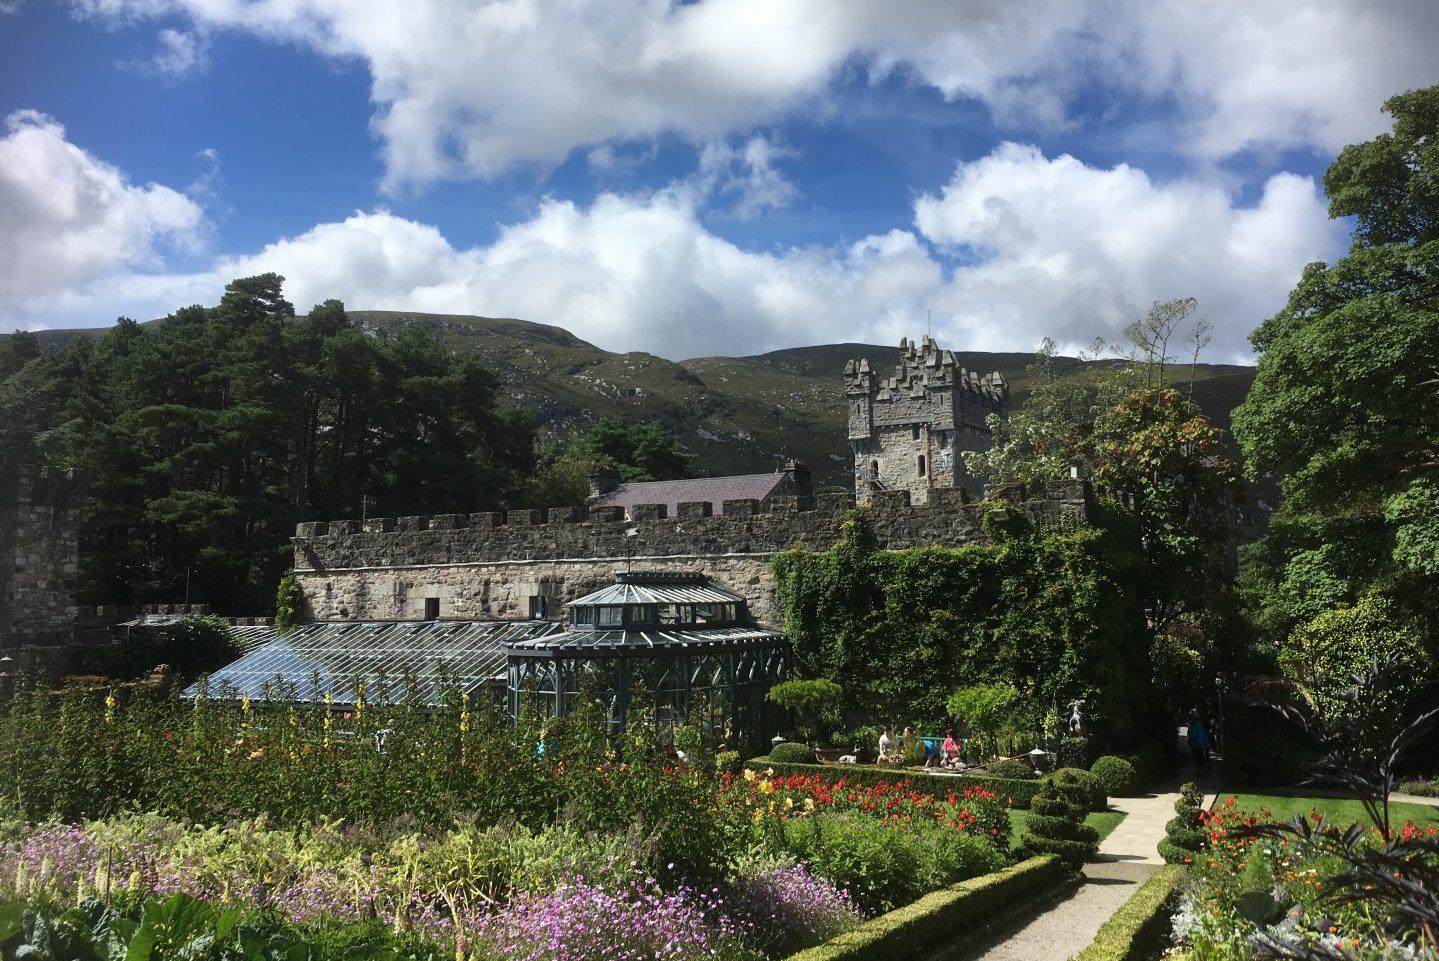 Glenveagh Castle and Gardens,